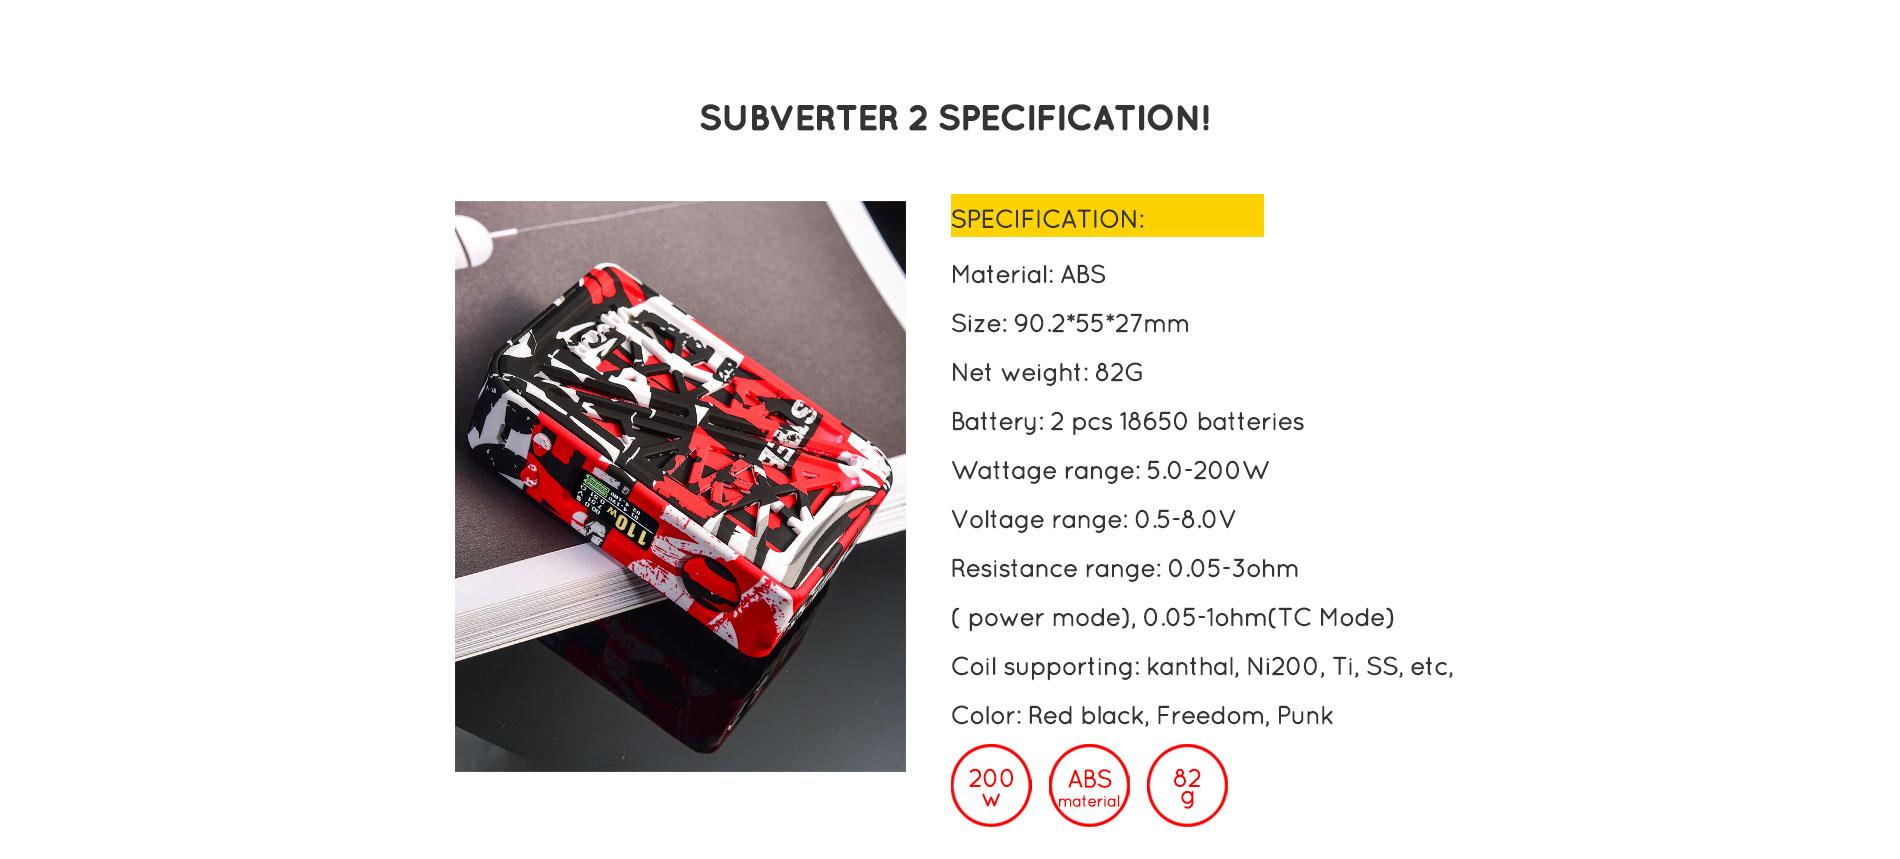 Subverter 2